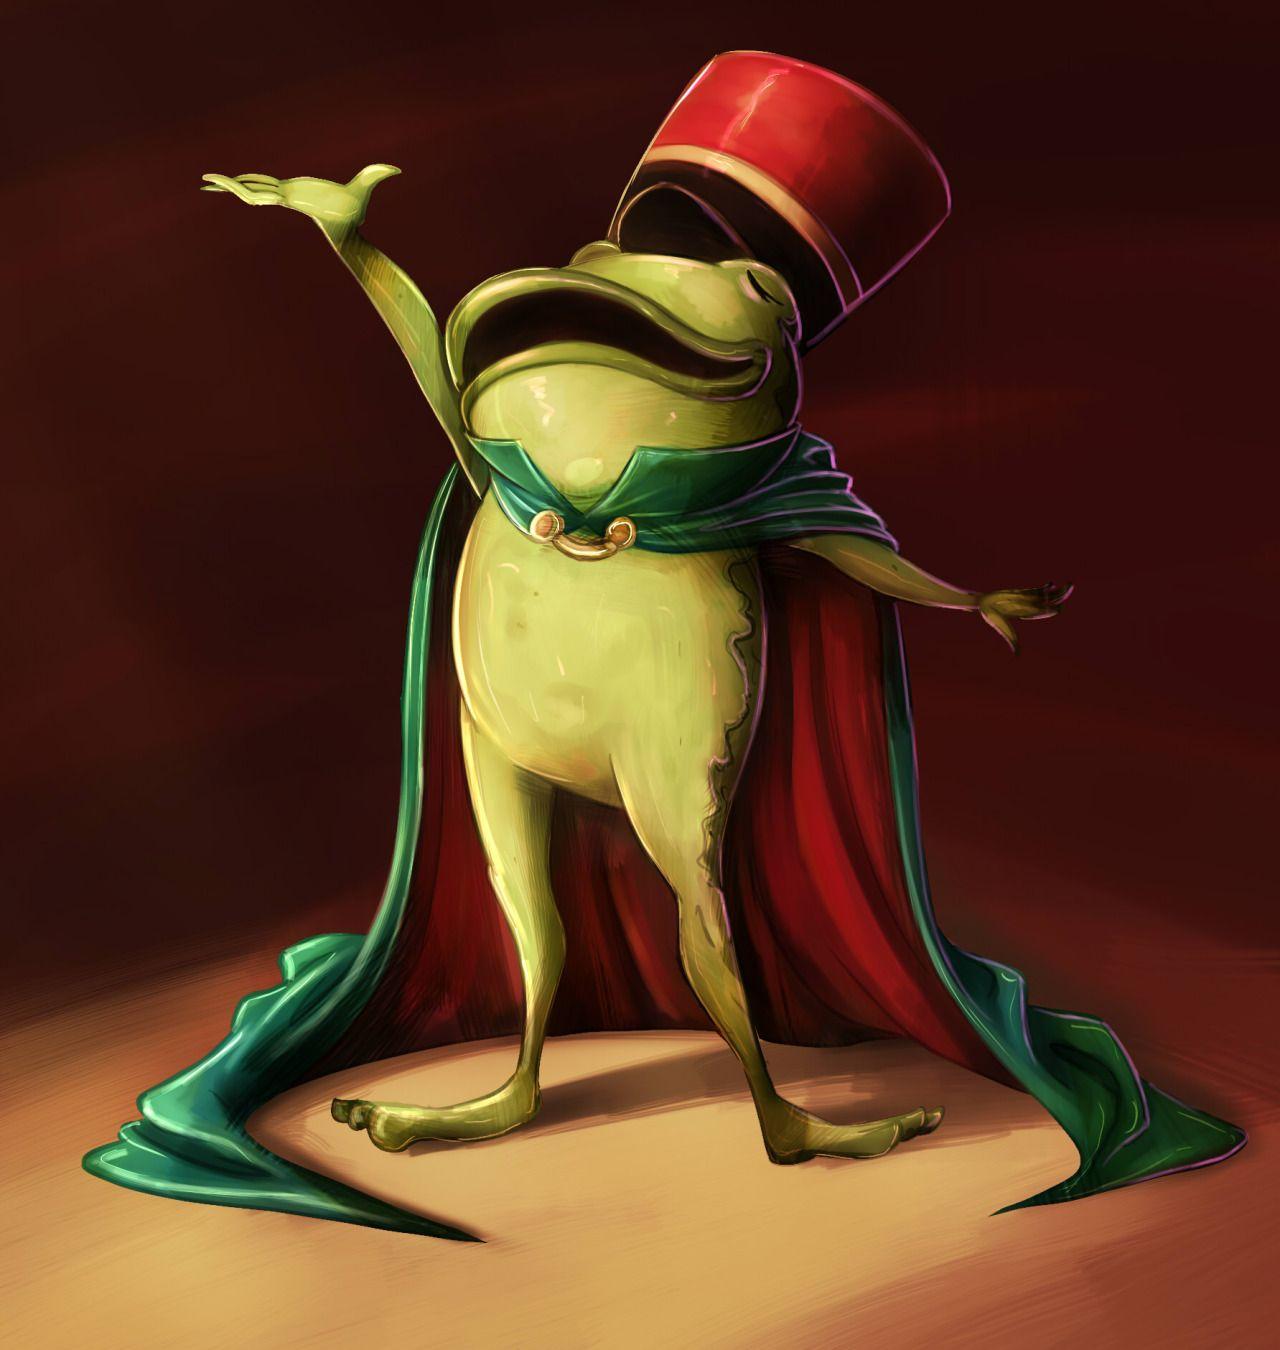 jackiepataki this frog and his voice JASON FUNDERBURKER